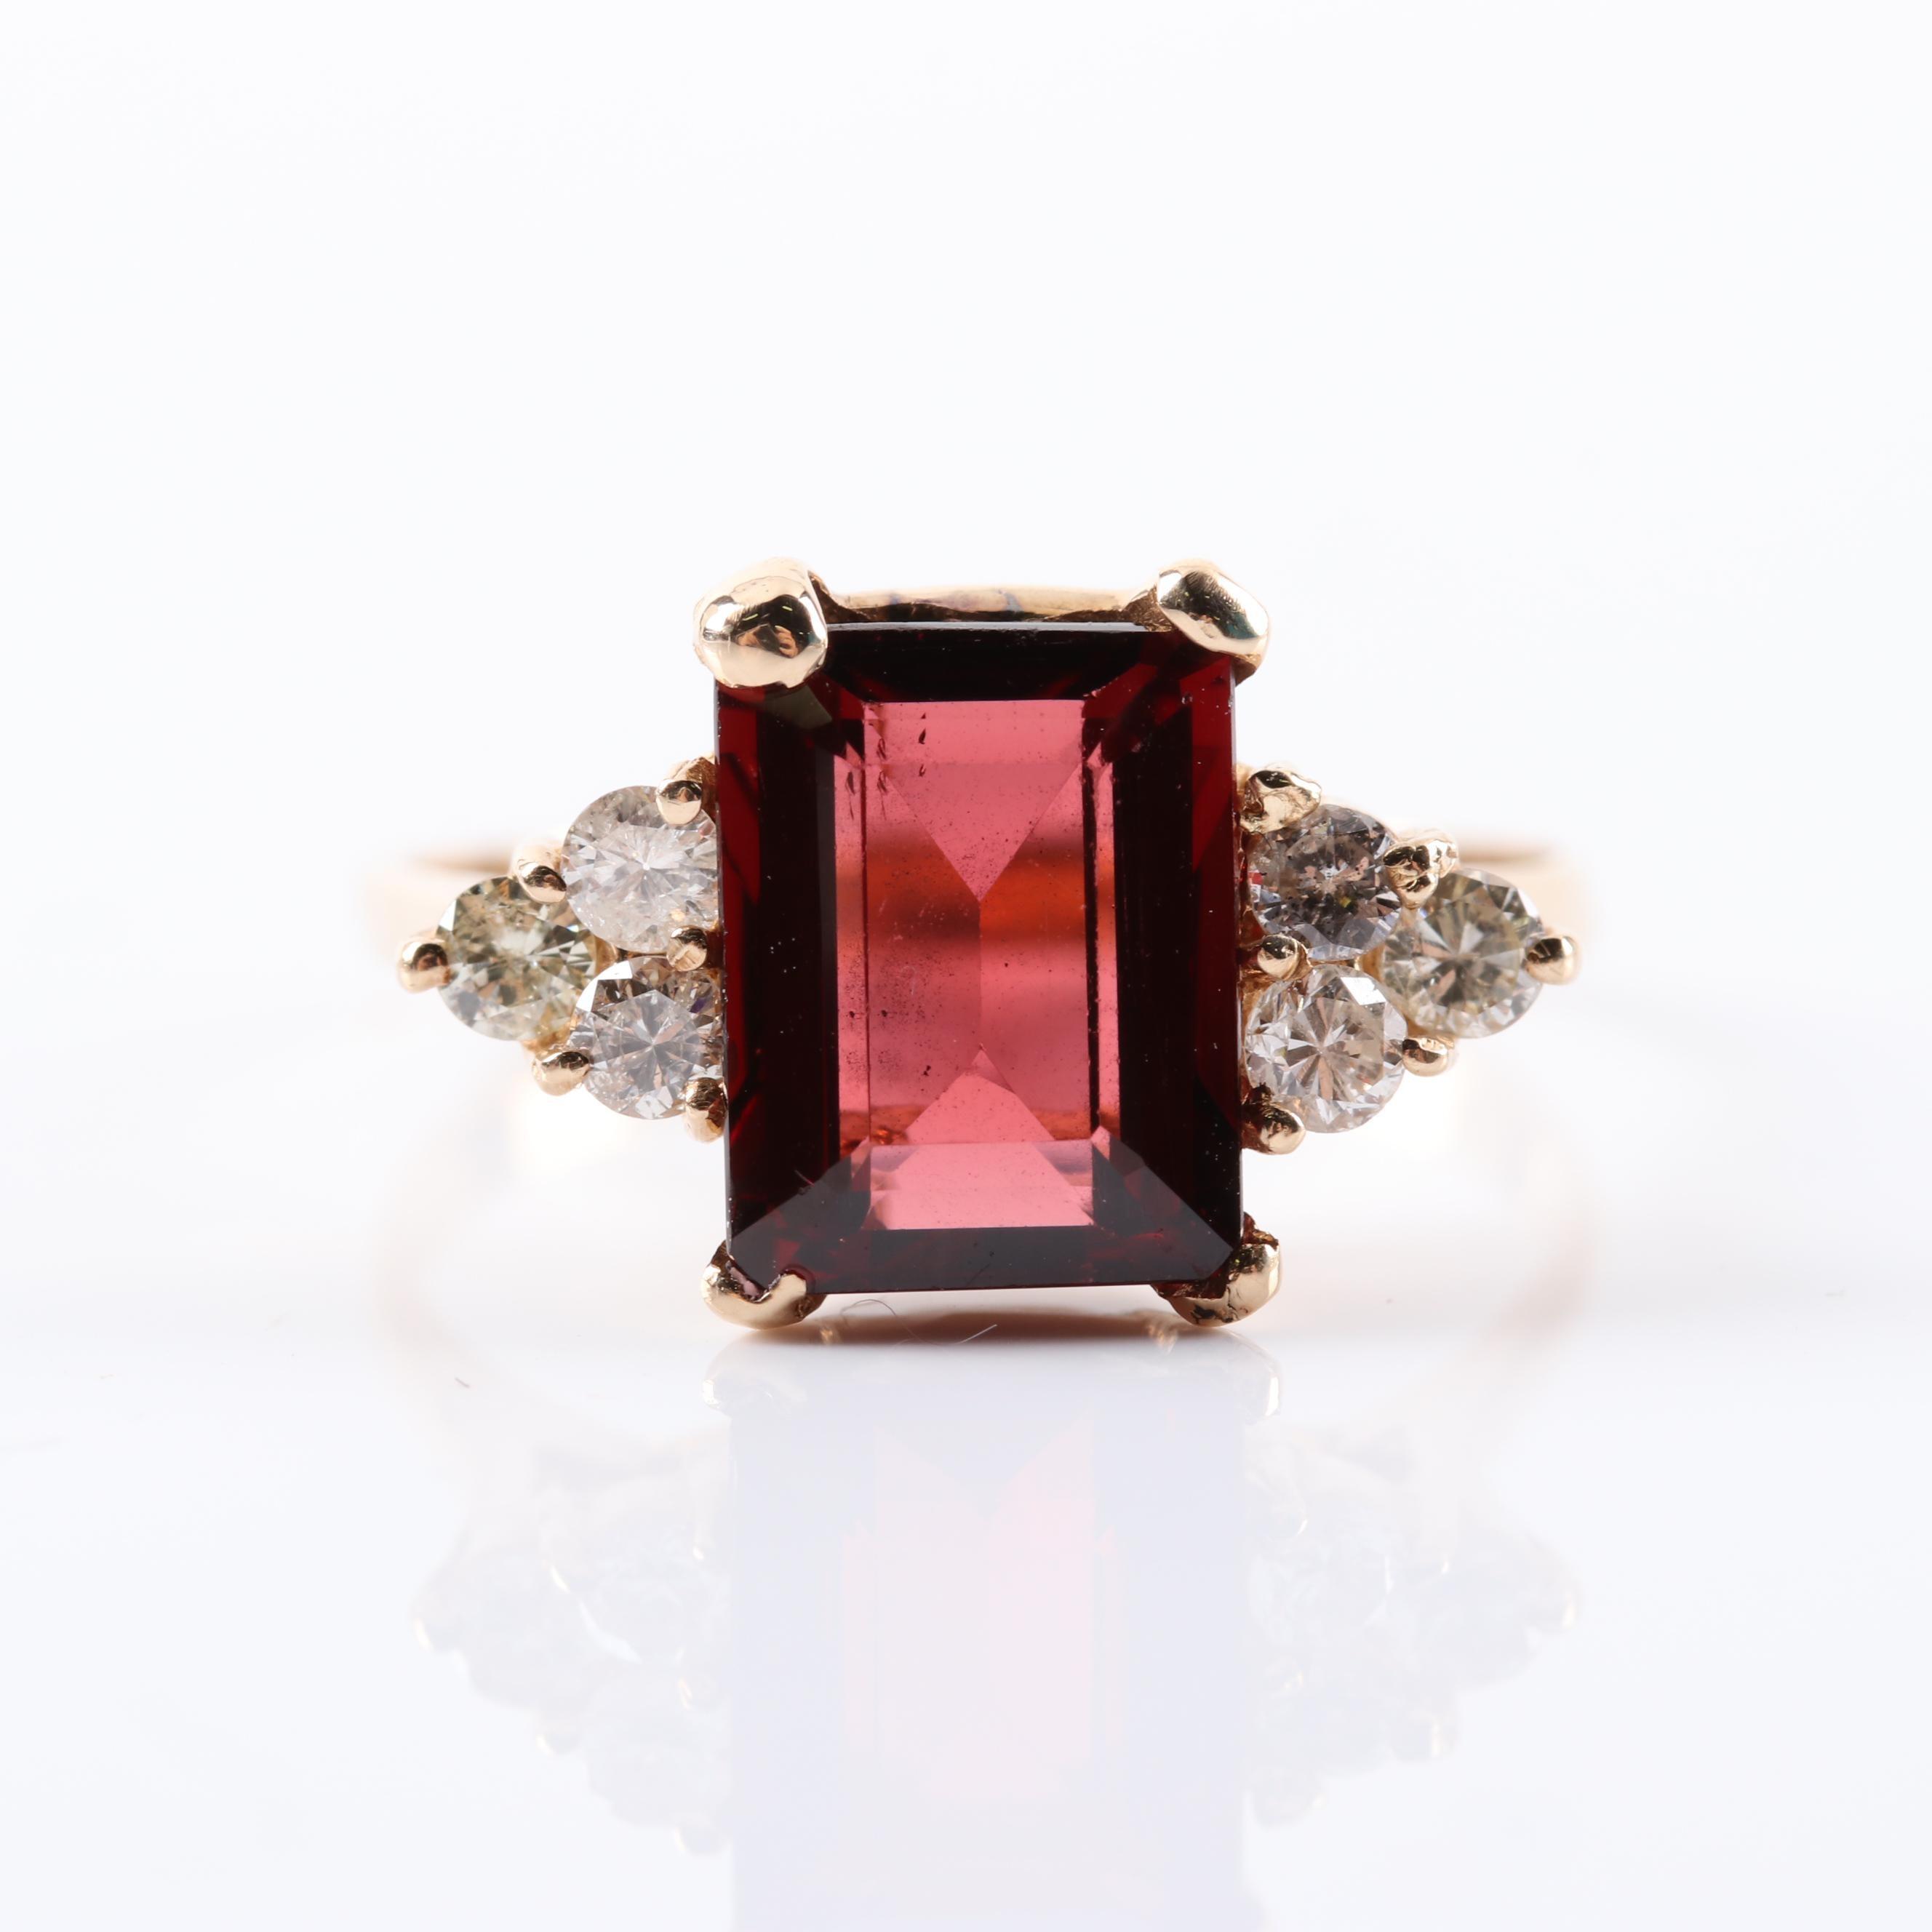 14K Yellow Gold 3.15 CT Garnet and Diamond Ring